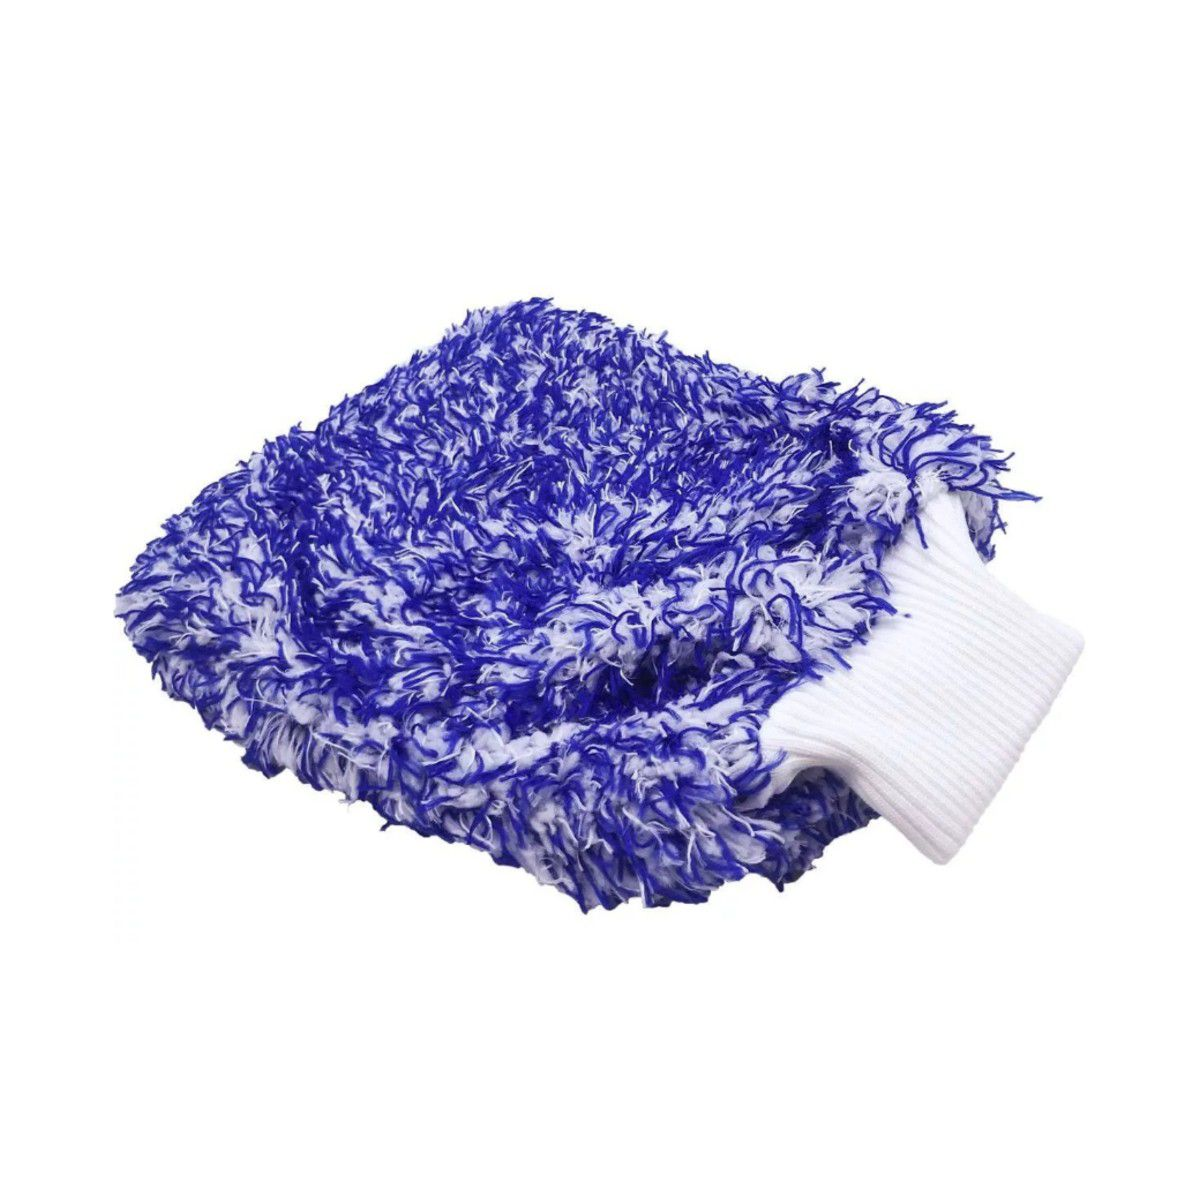 Luva De Microfibra Tornado Azul Detailer